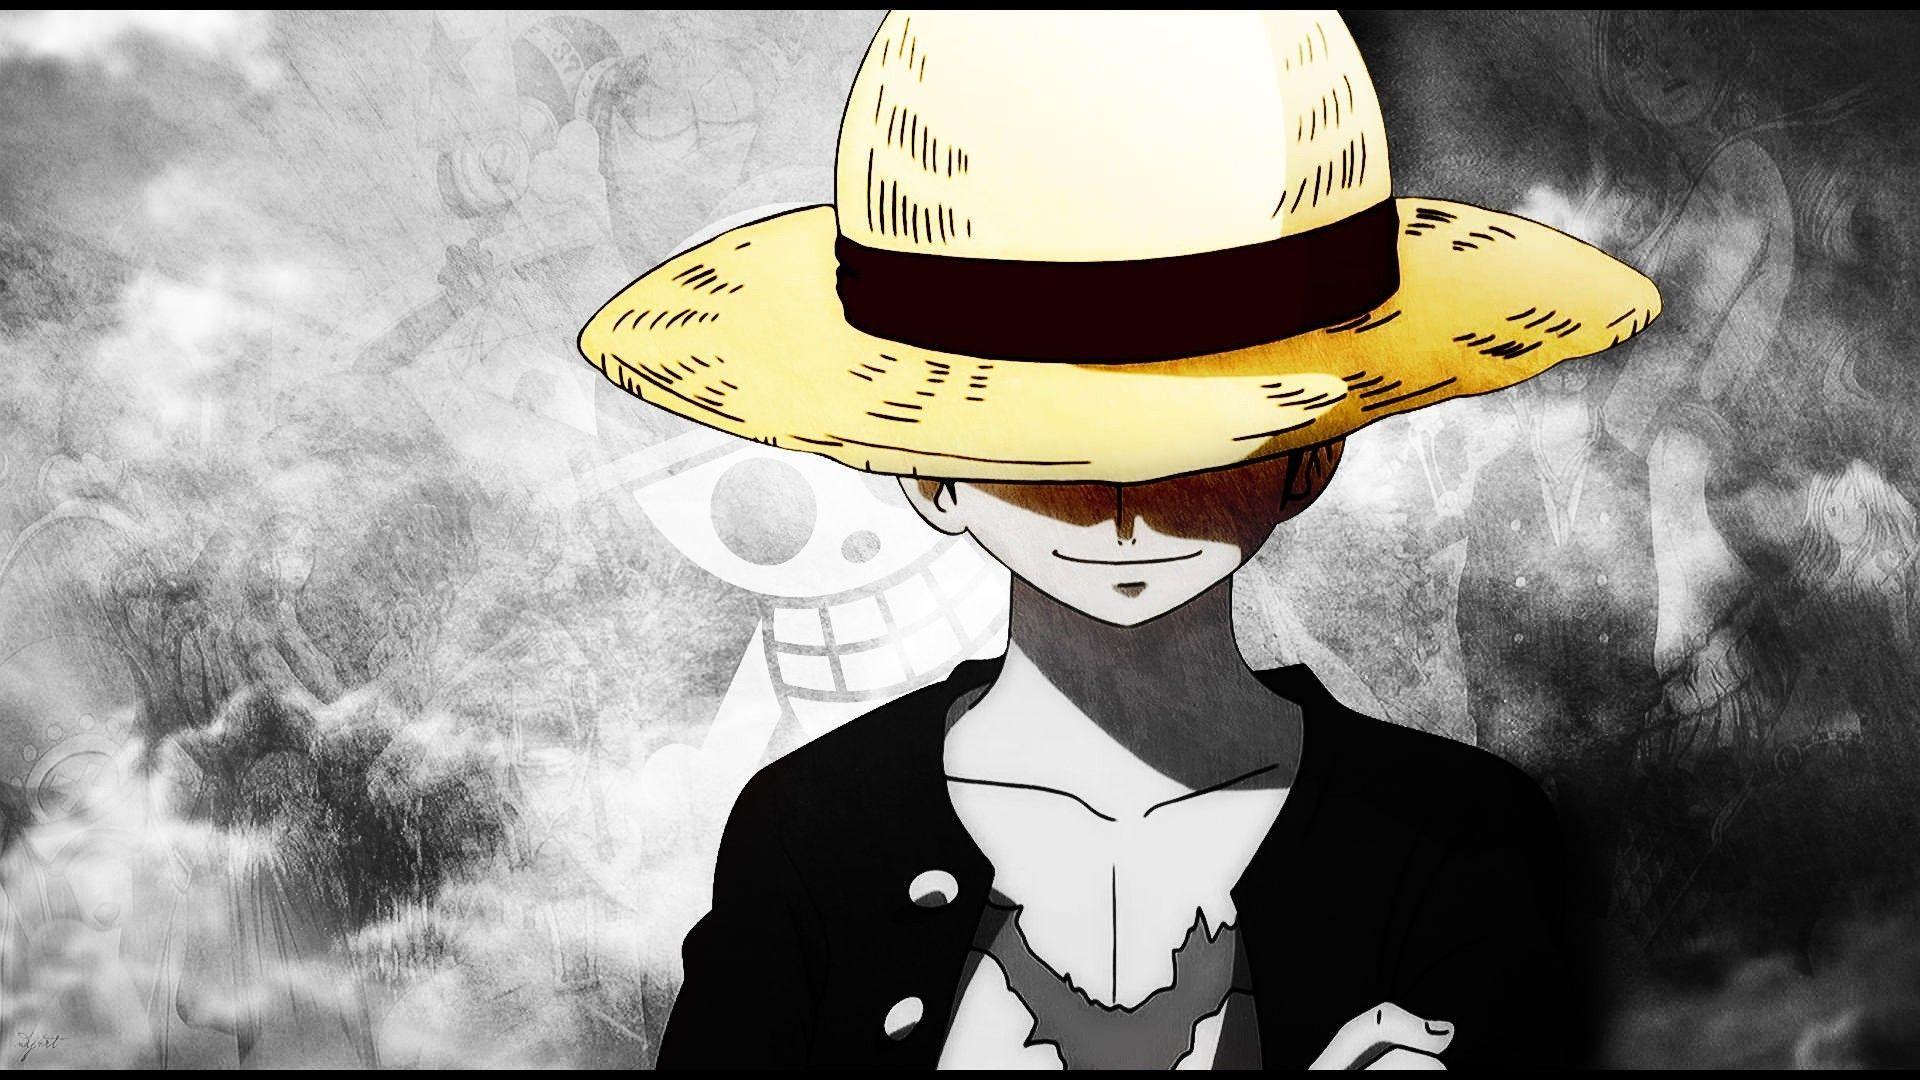 1920x1080 One Piece hình nền Luffy